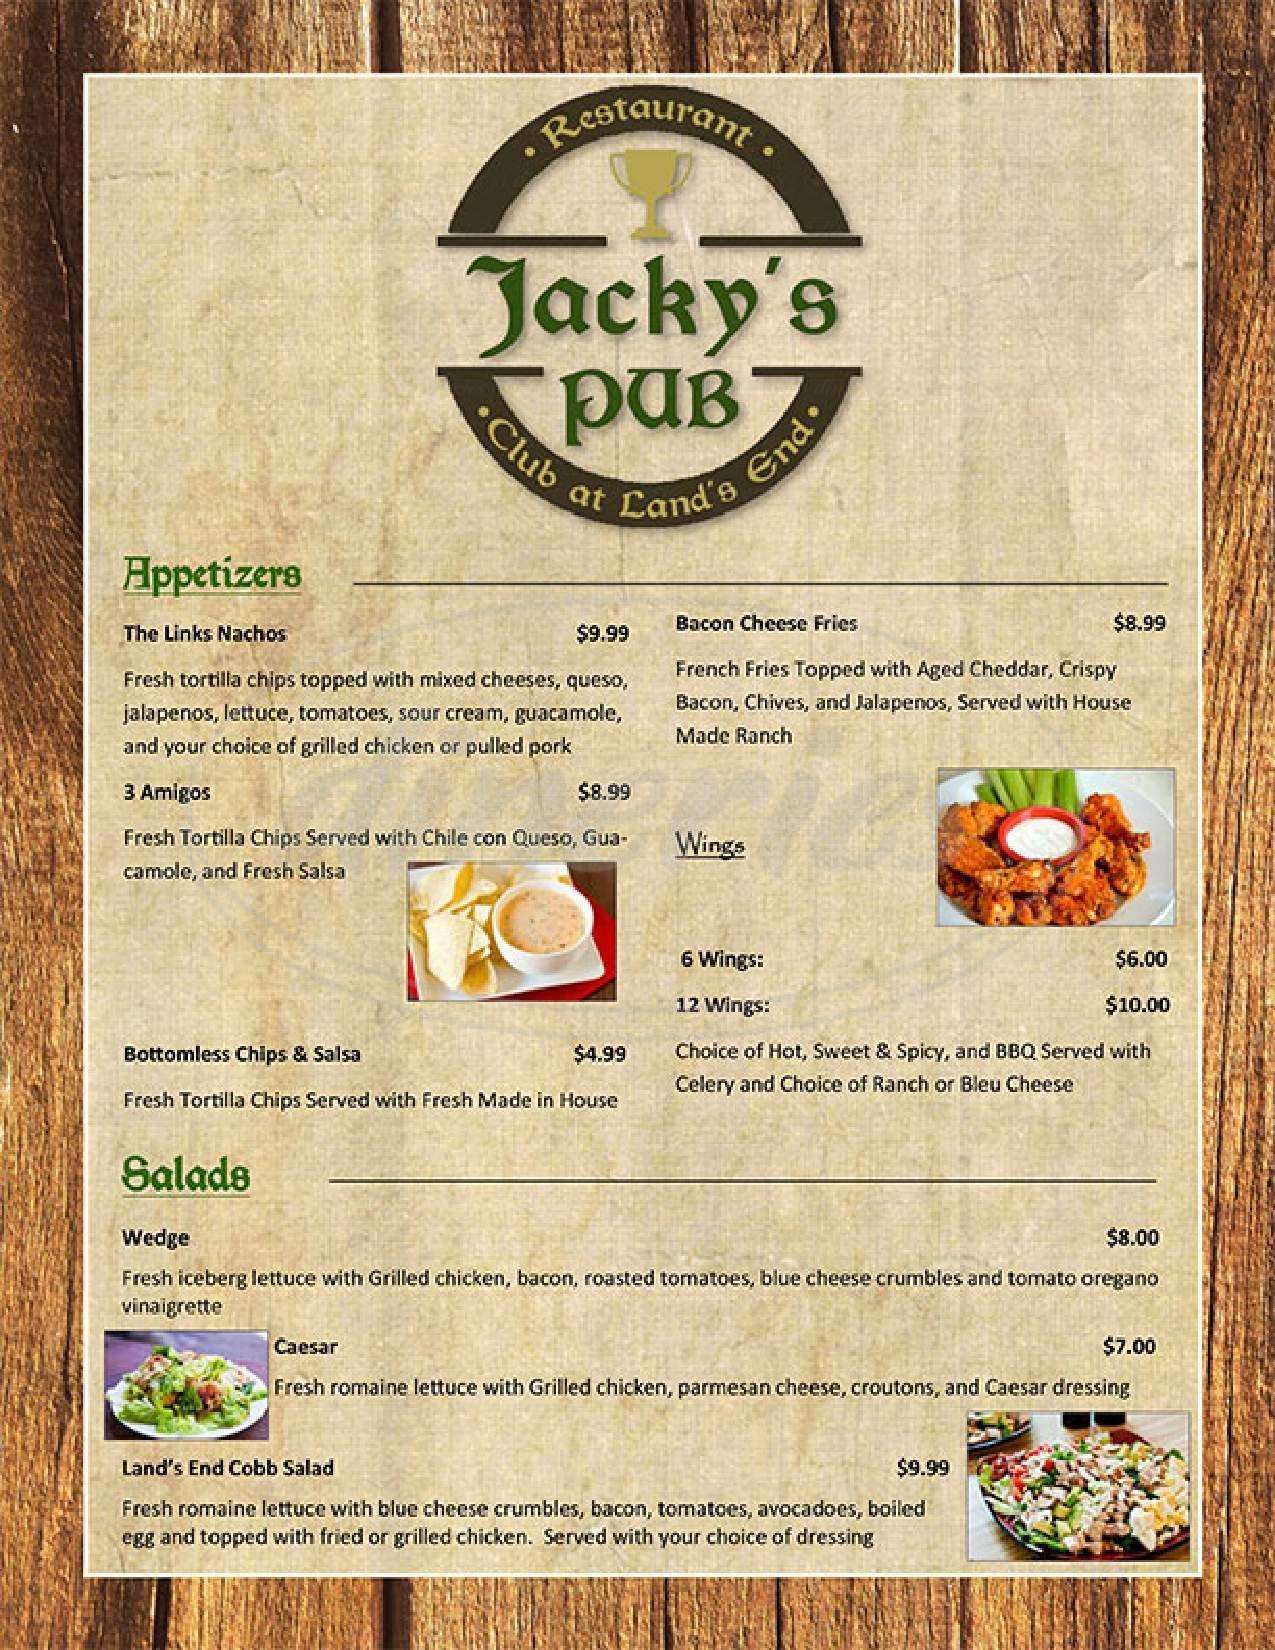 menu for Land's End